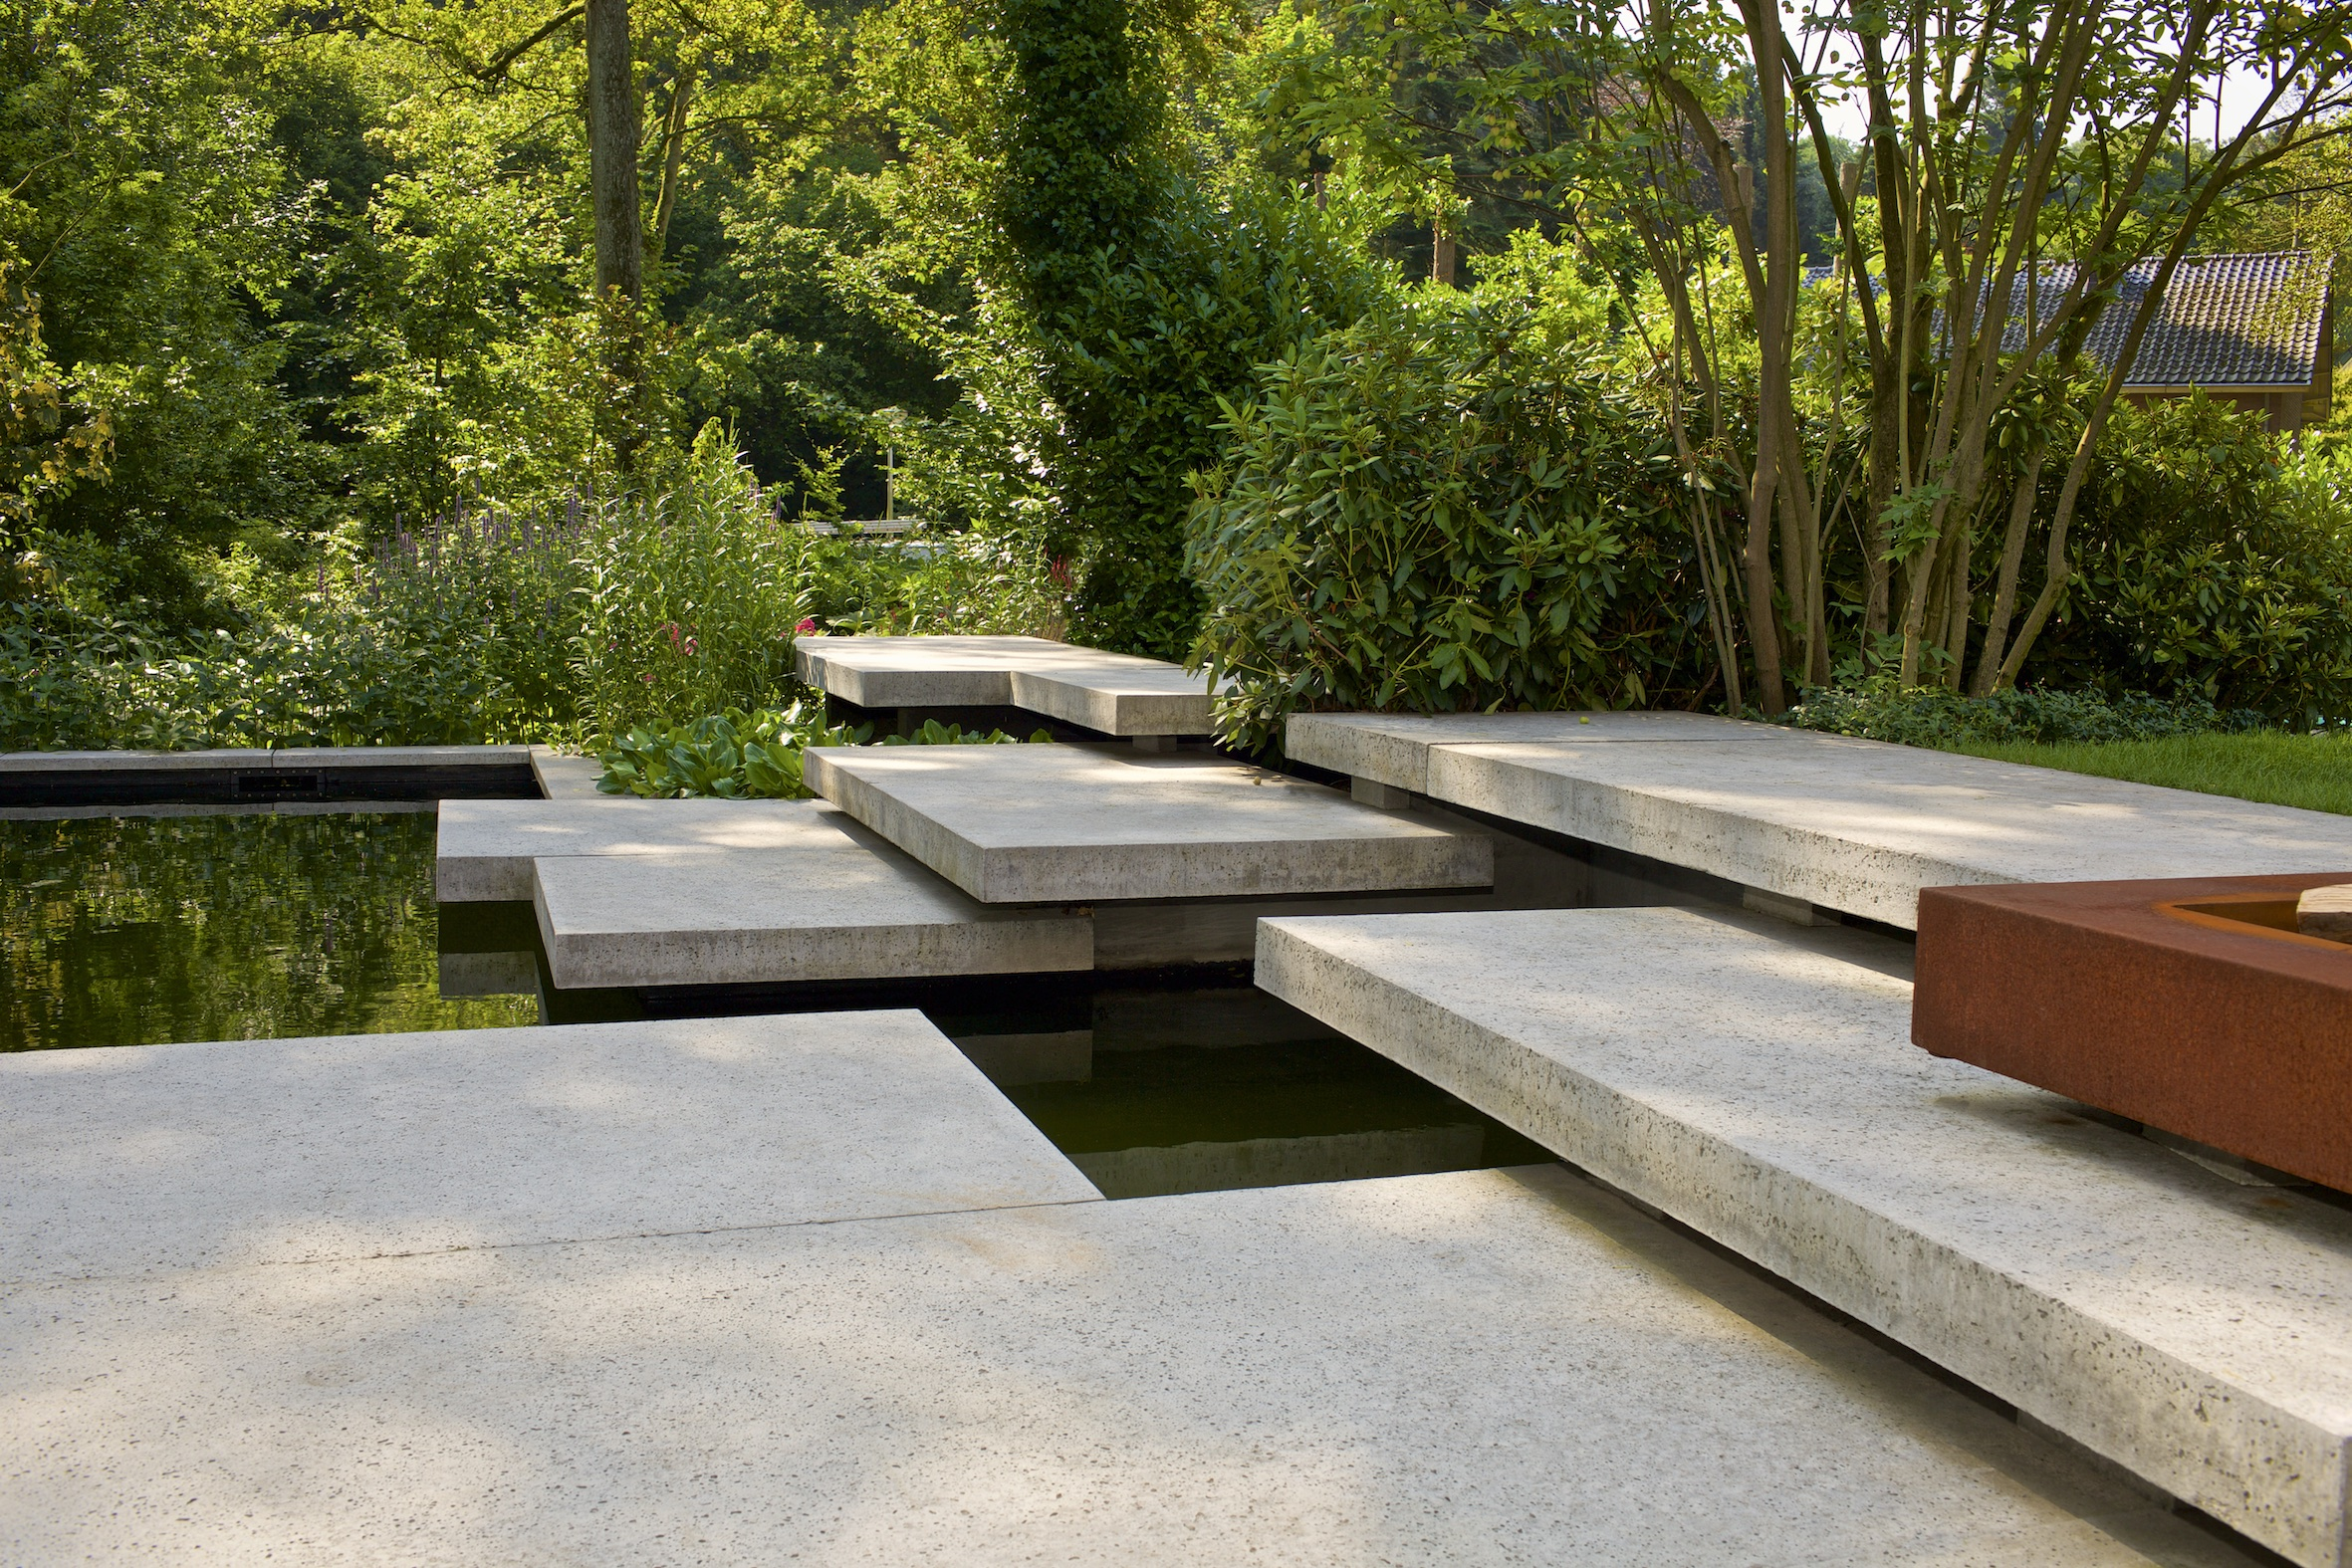 Super Neerlands mooiste tuin komt van hovenier Sterk en ligt in Beek IA28